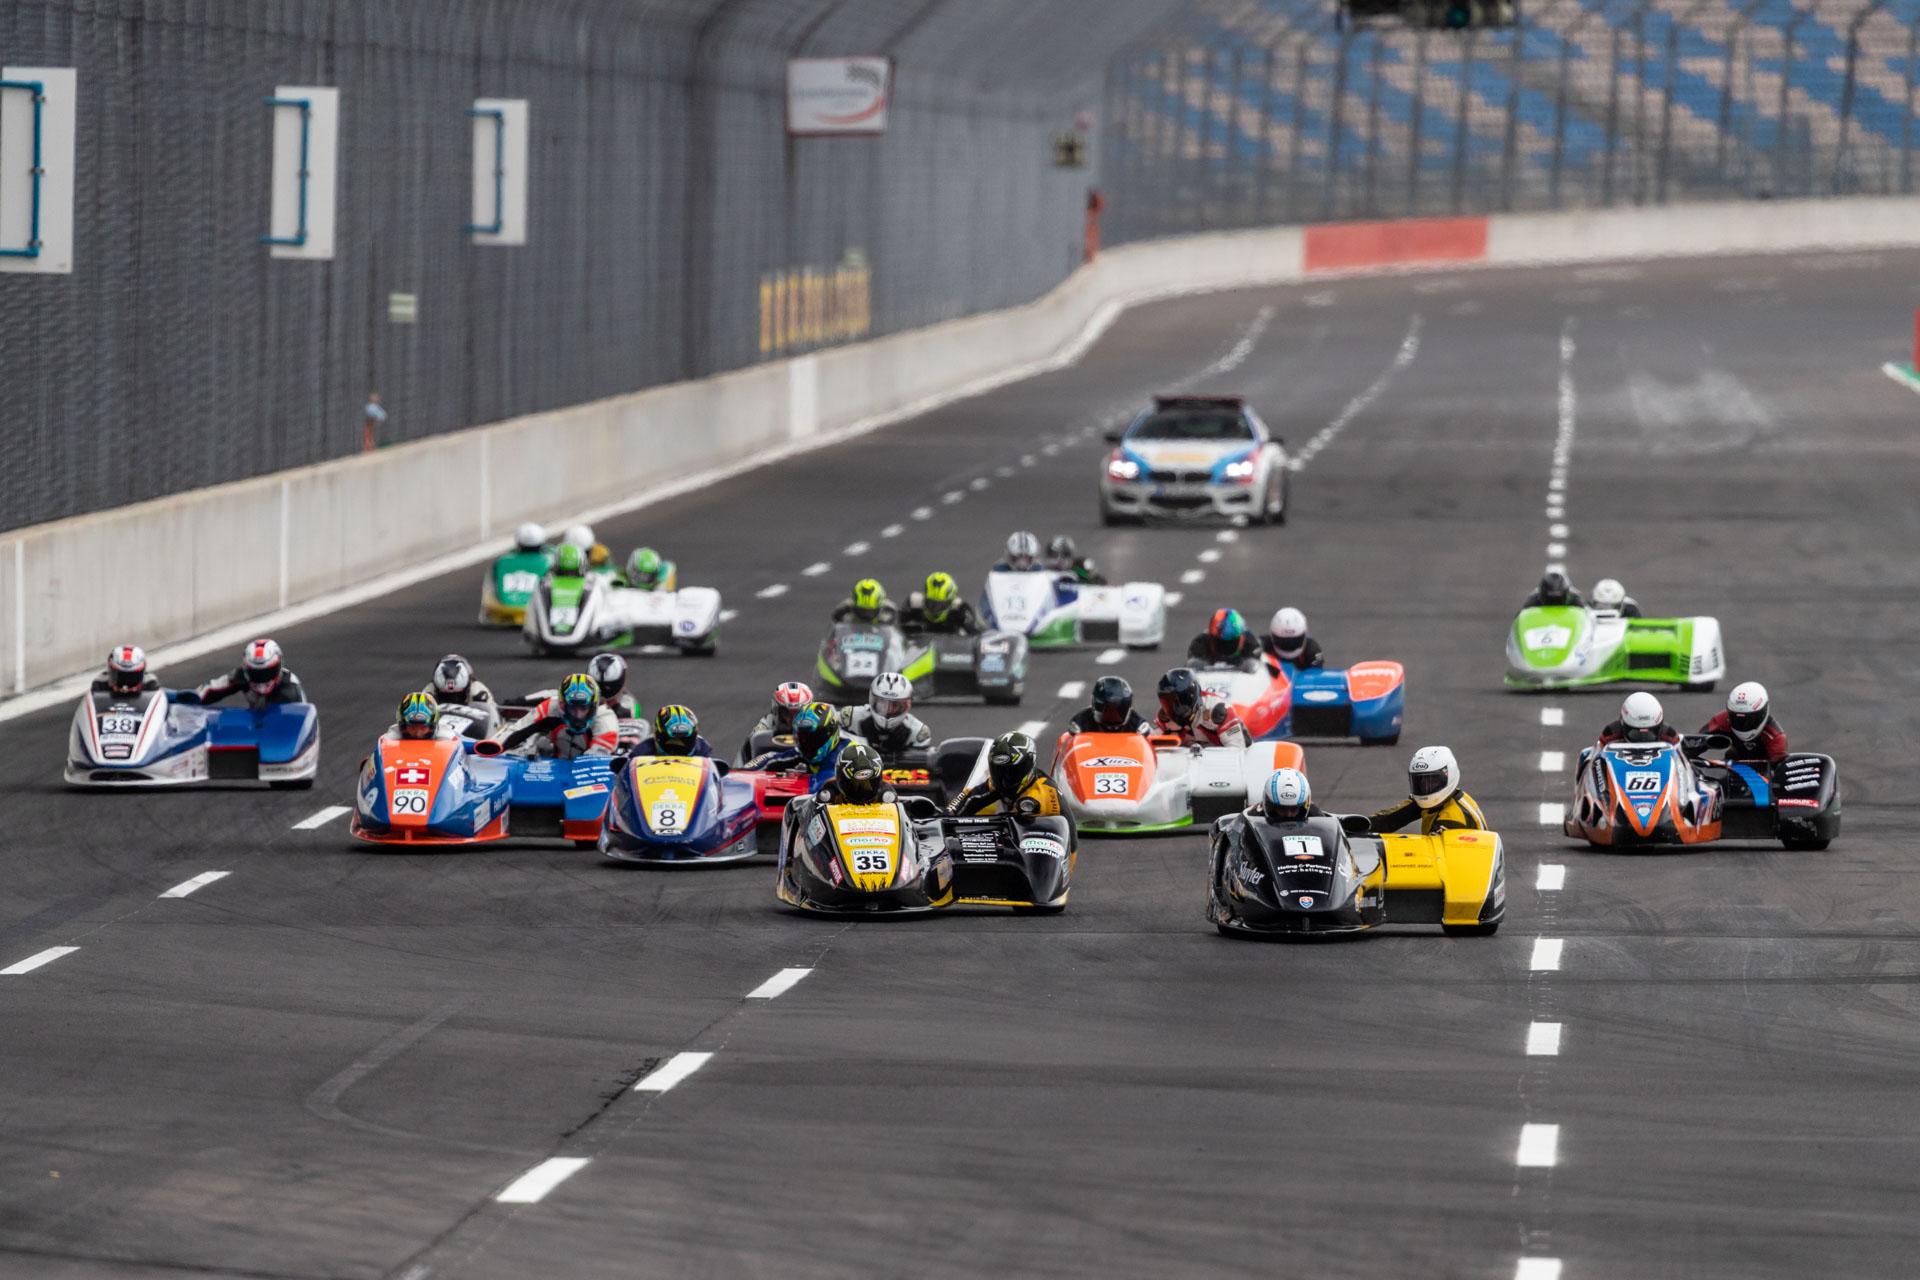 IDM_Lausitzring2018_Sidecars-Rennen1-web-6